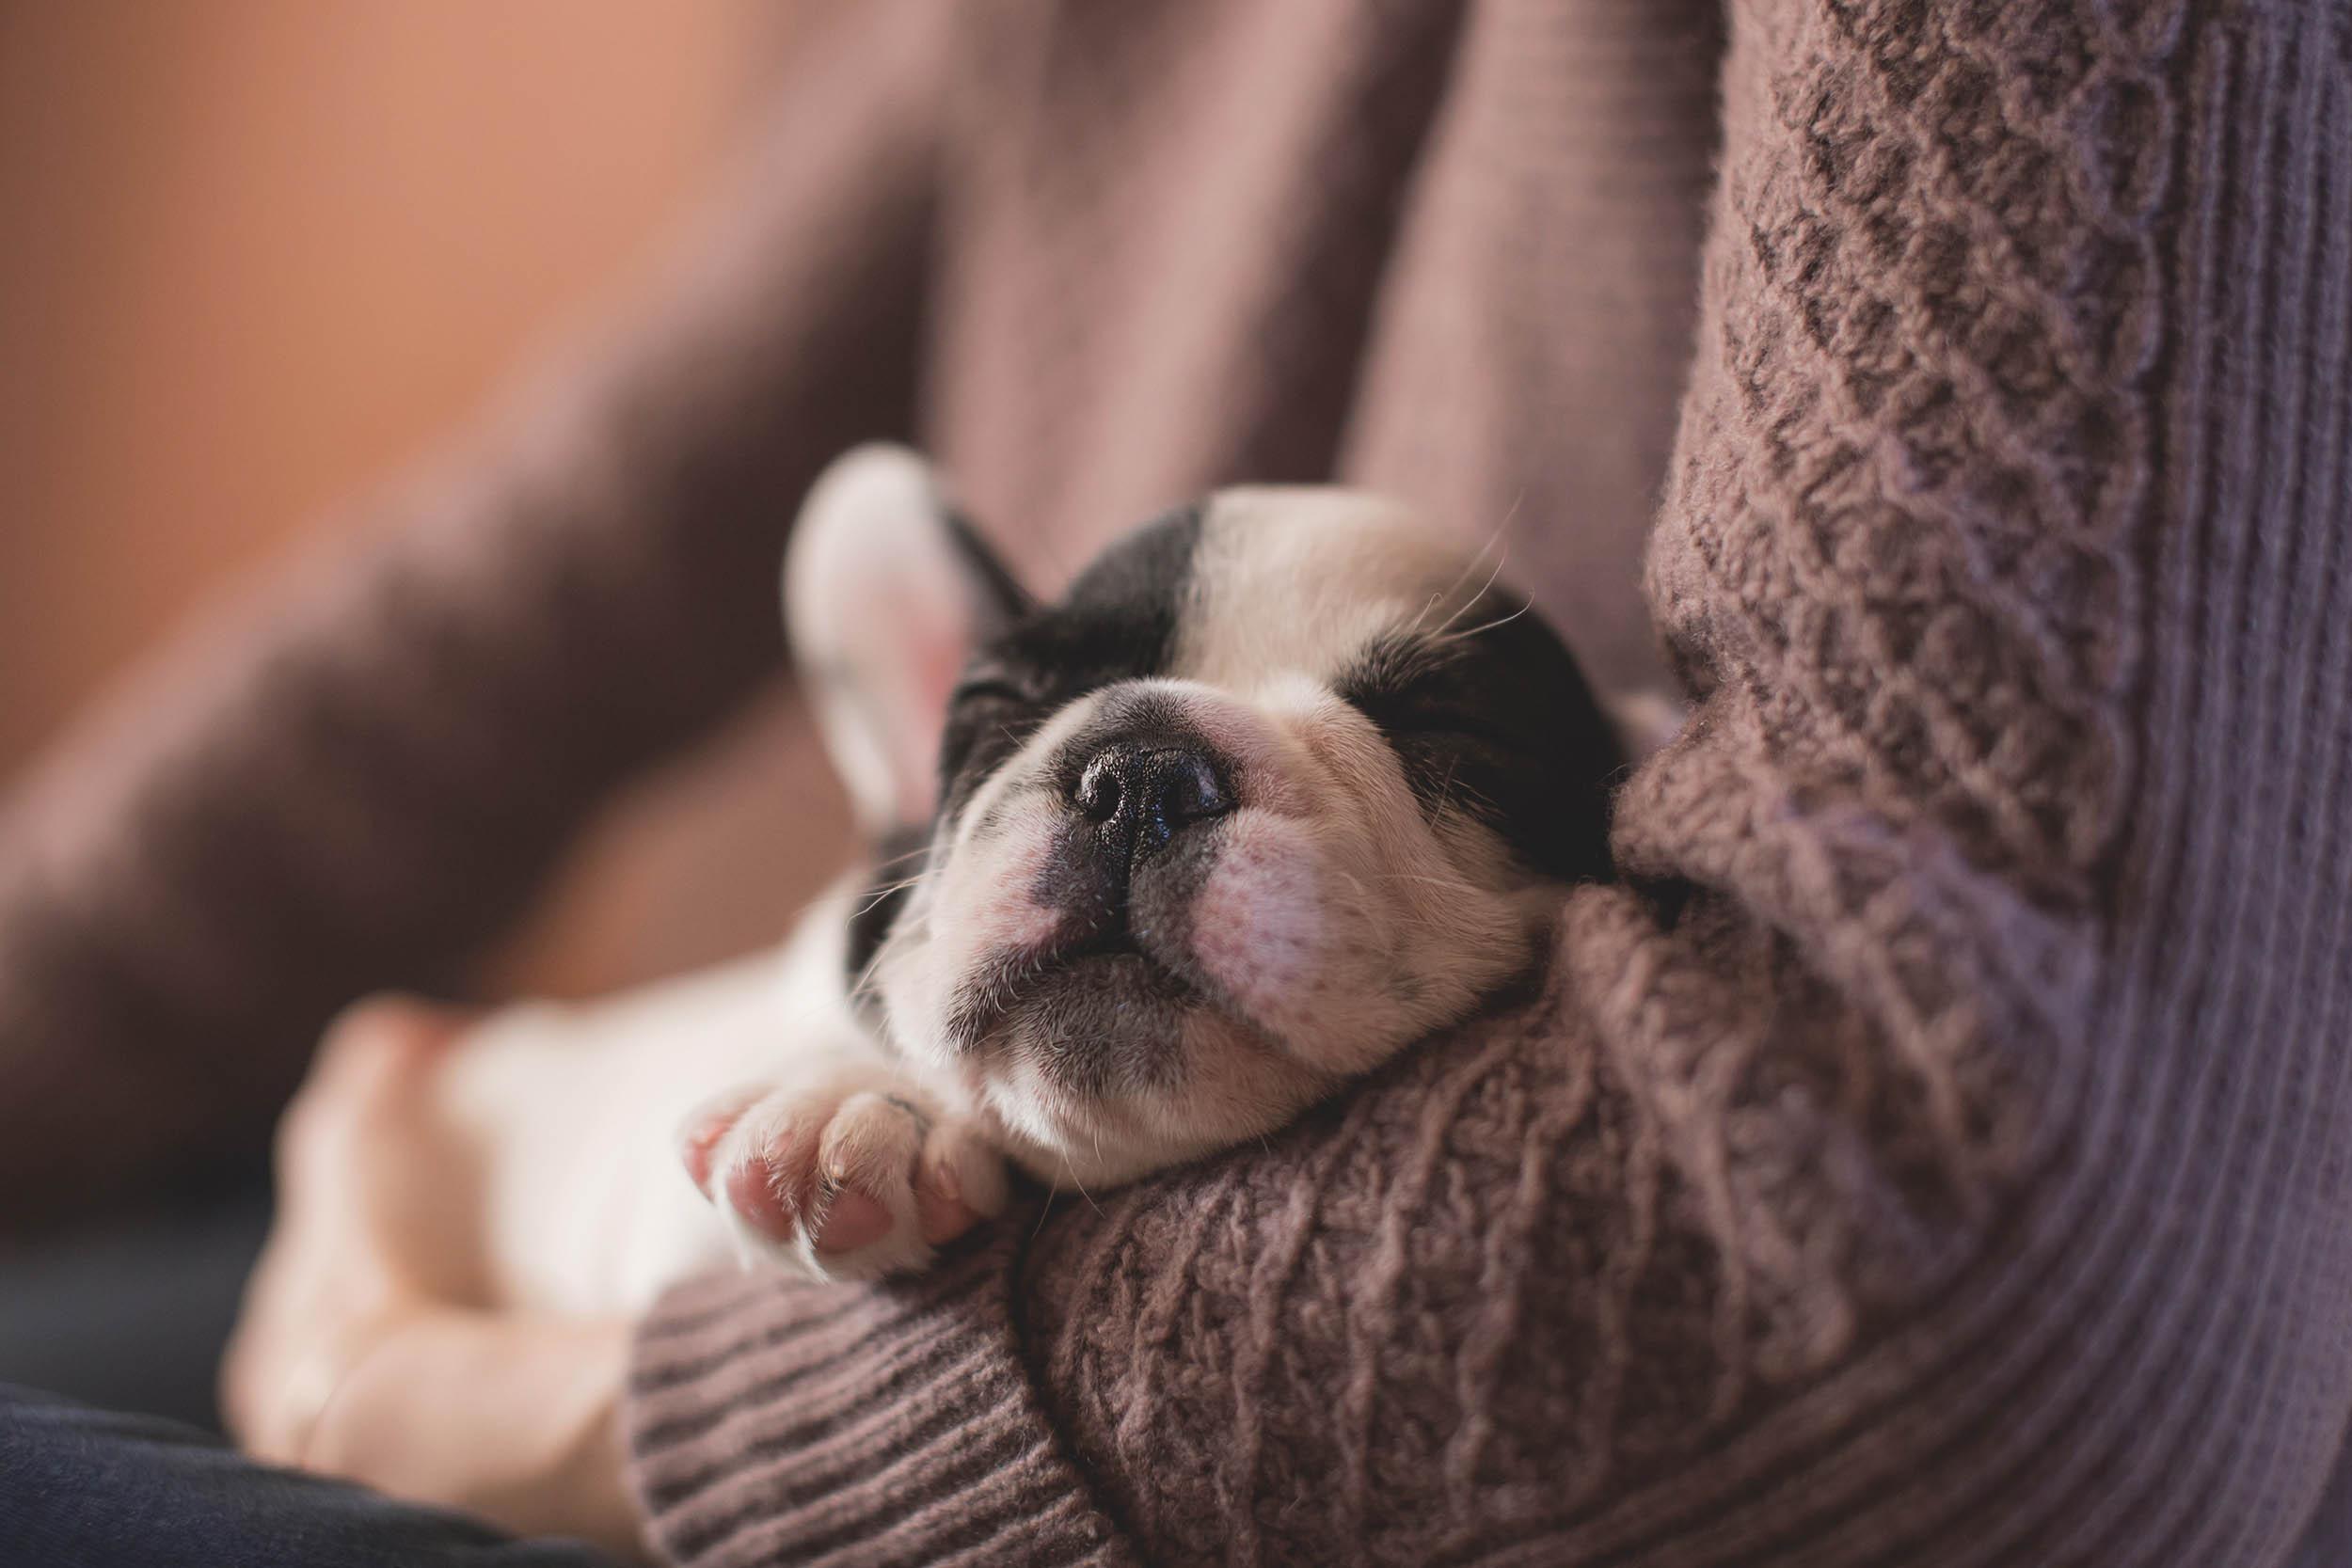 dog sleeping basics photography How to photograph your dog